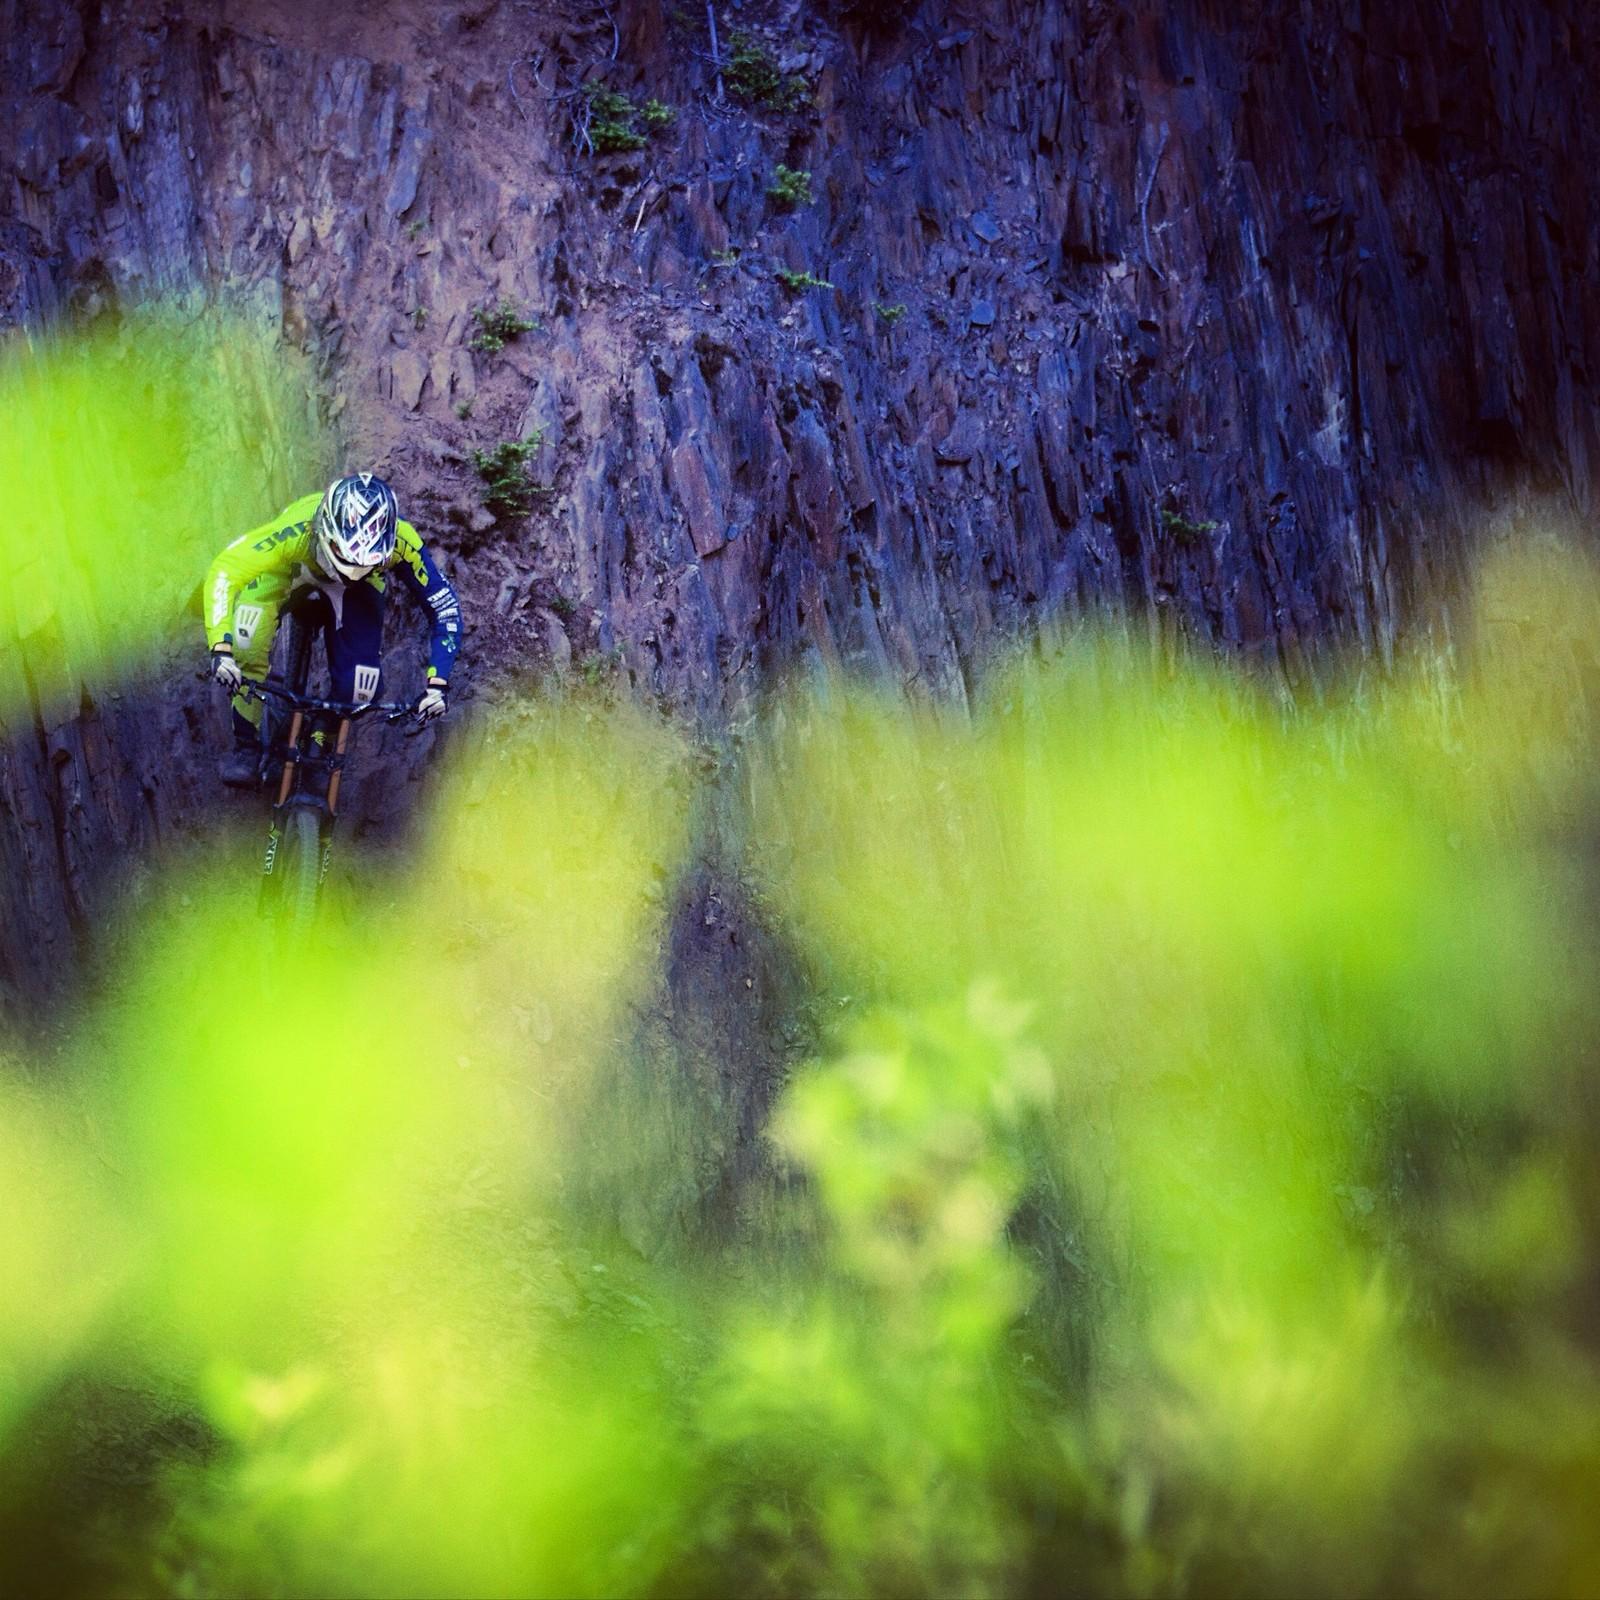 Blending In - Dylan Kish - Mountain Biking Pictures - Vital MTB